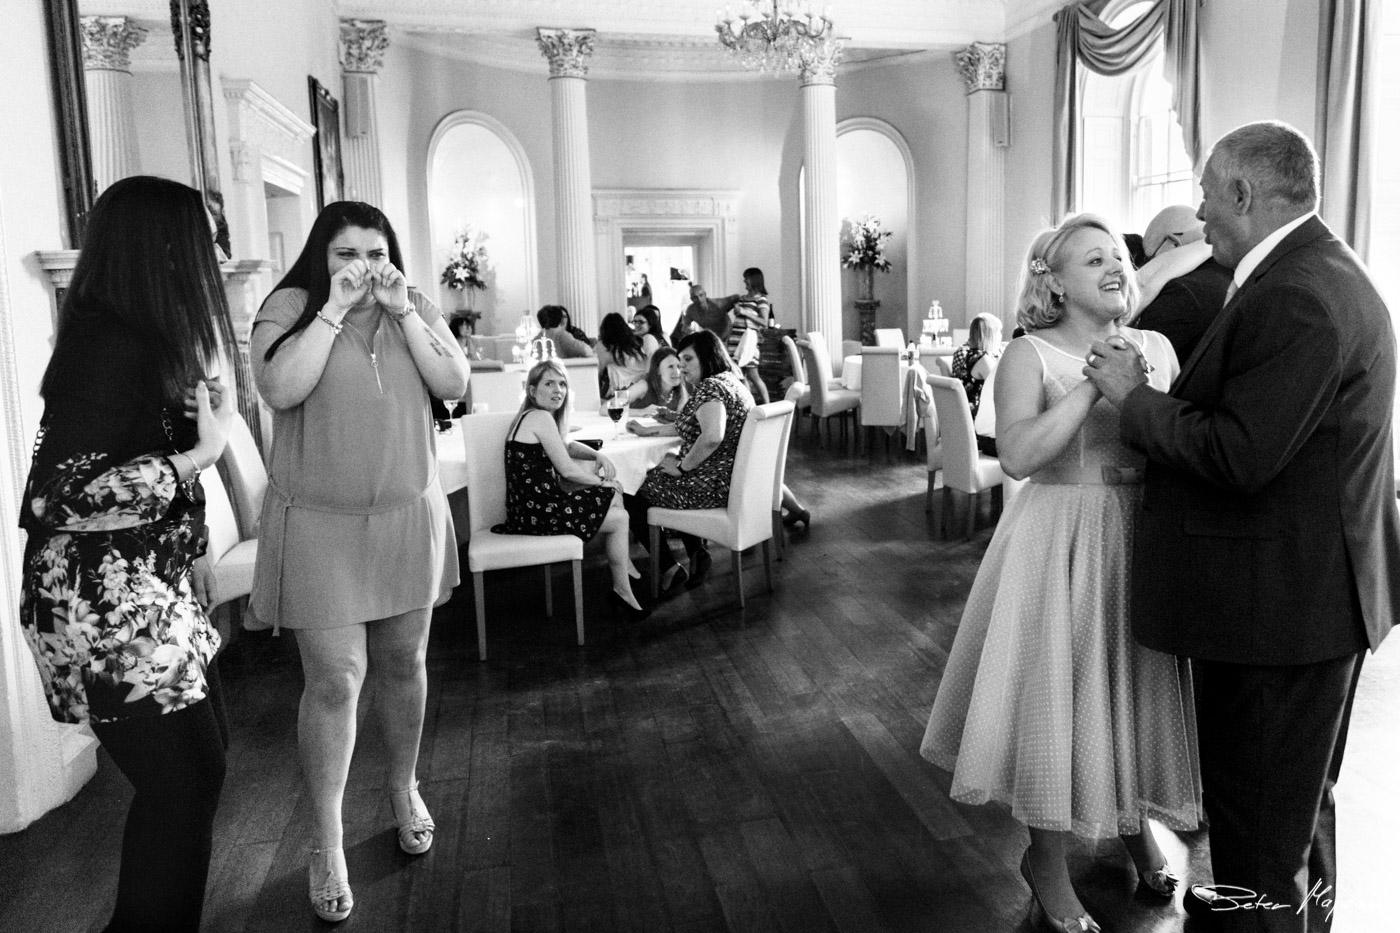 Colwick-hall-wedding-photography-68.jpg